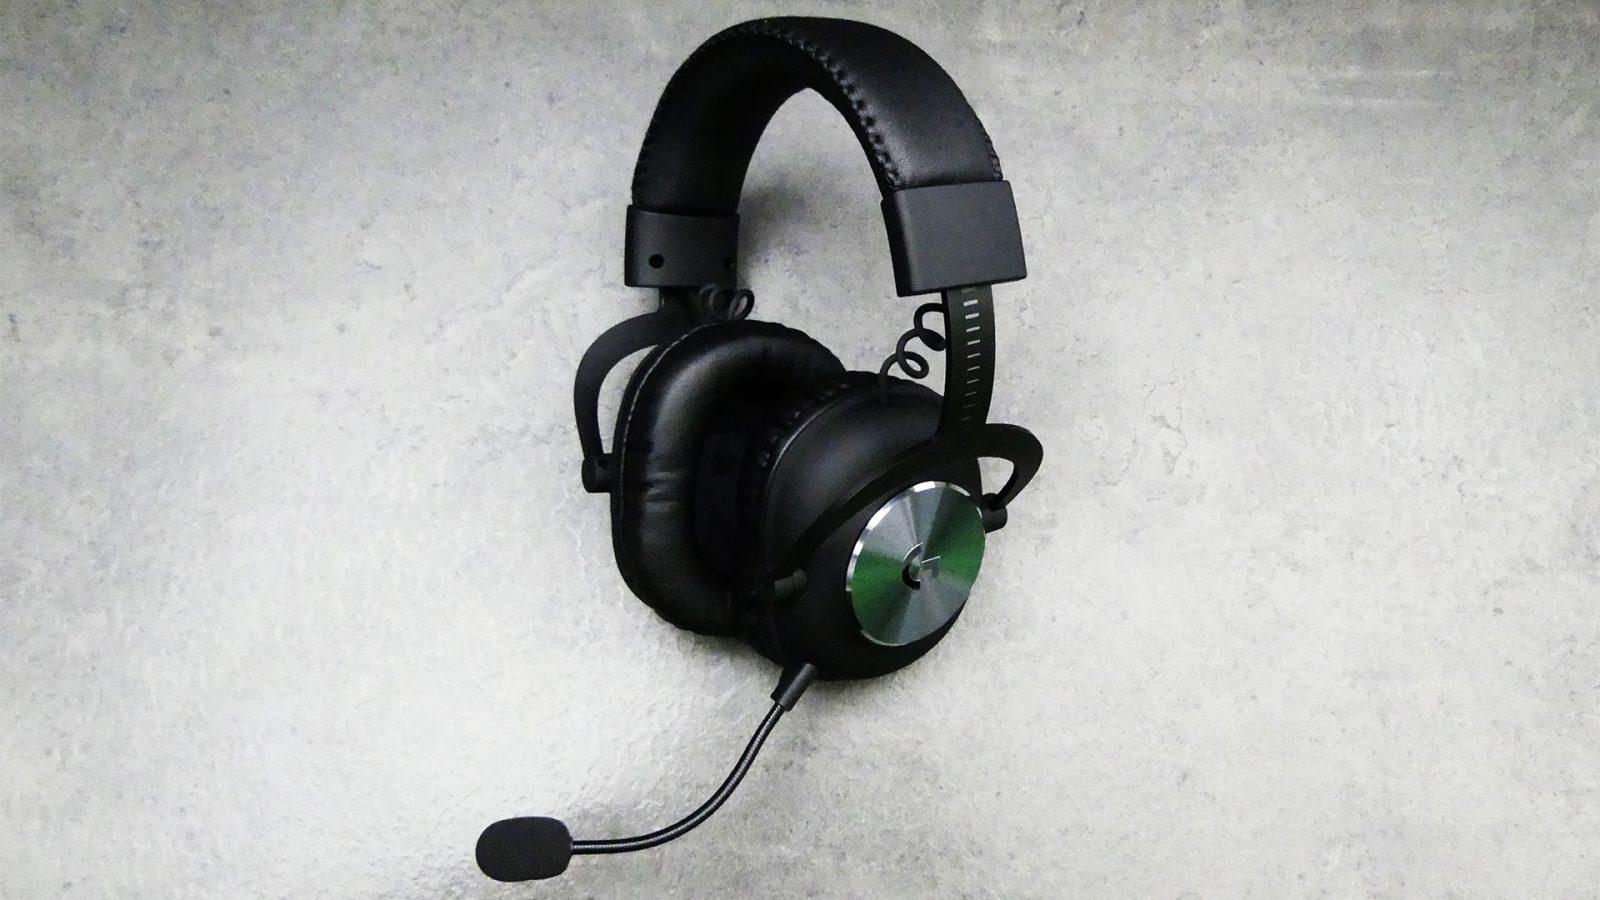 Logitech G Pro X Headset Review - Creator Hype